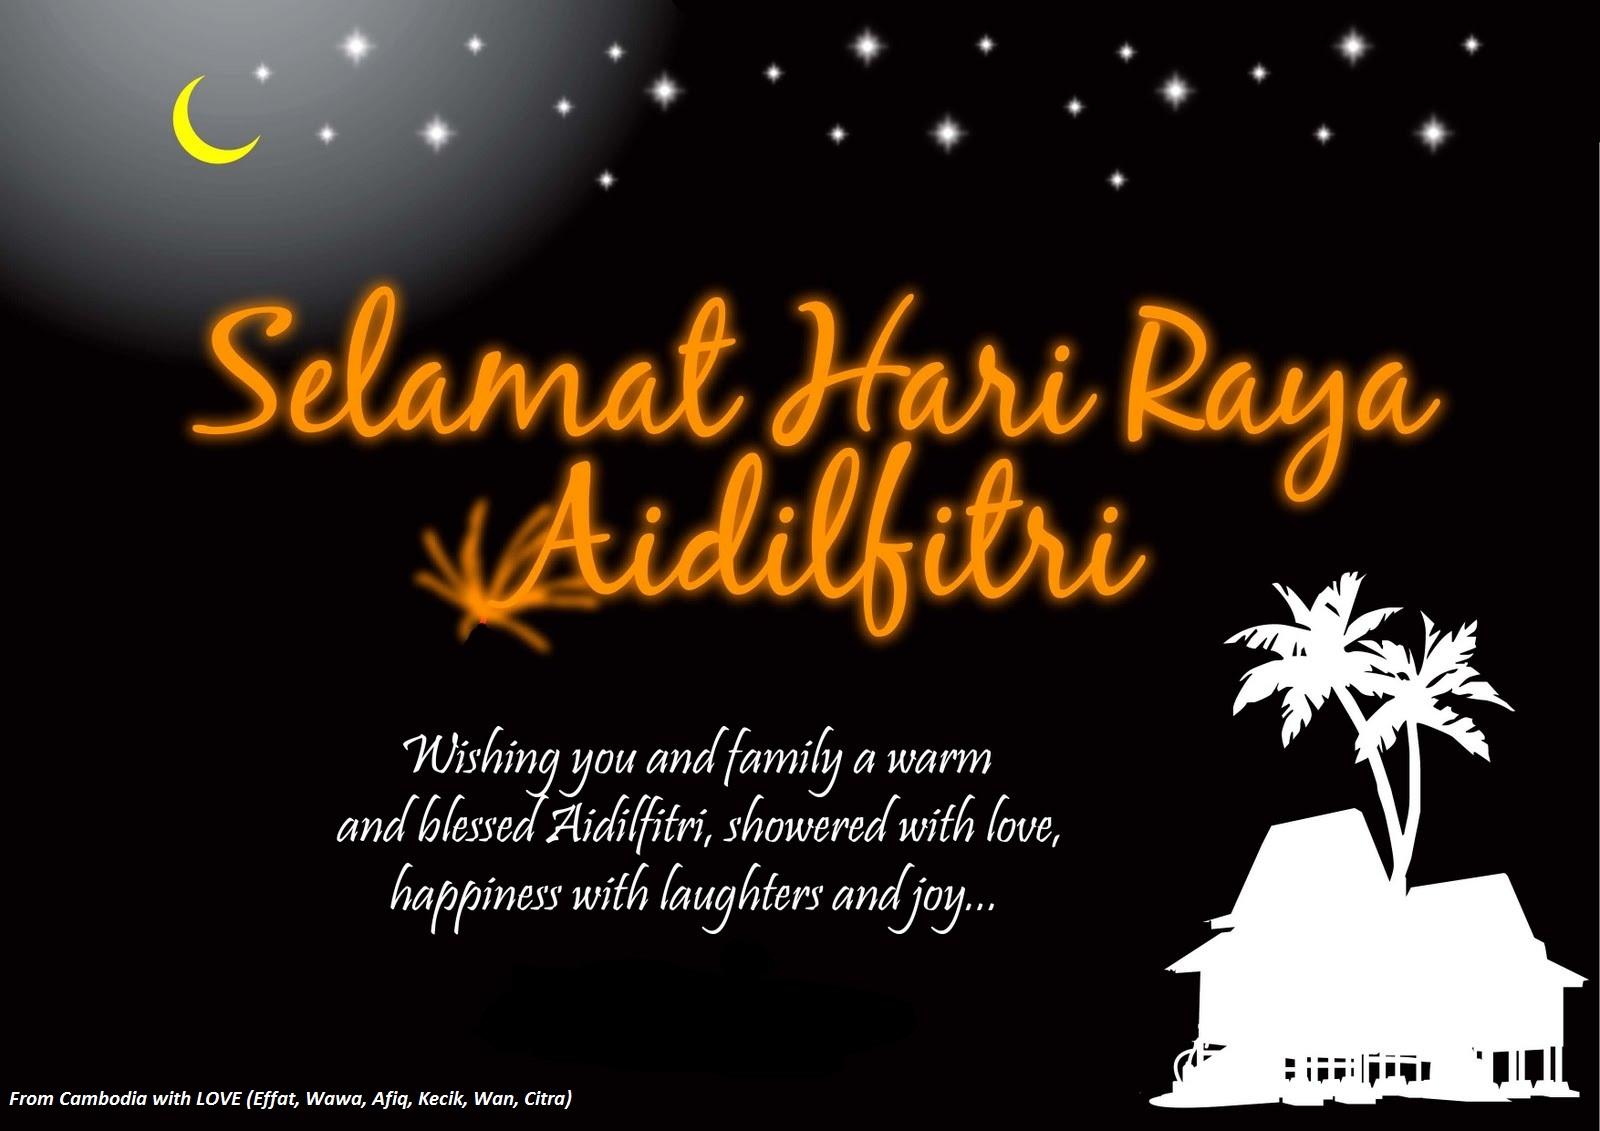 hari raya puasa Also known as hari raya aidilfitri, hari raya puasa is the most prominent and  celebrated occasion in the muslim community do you know that.